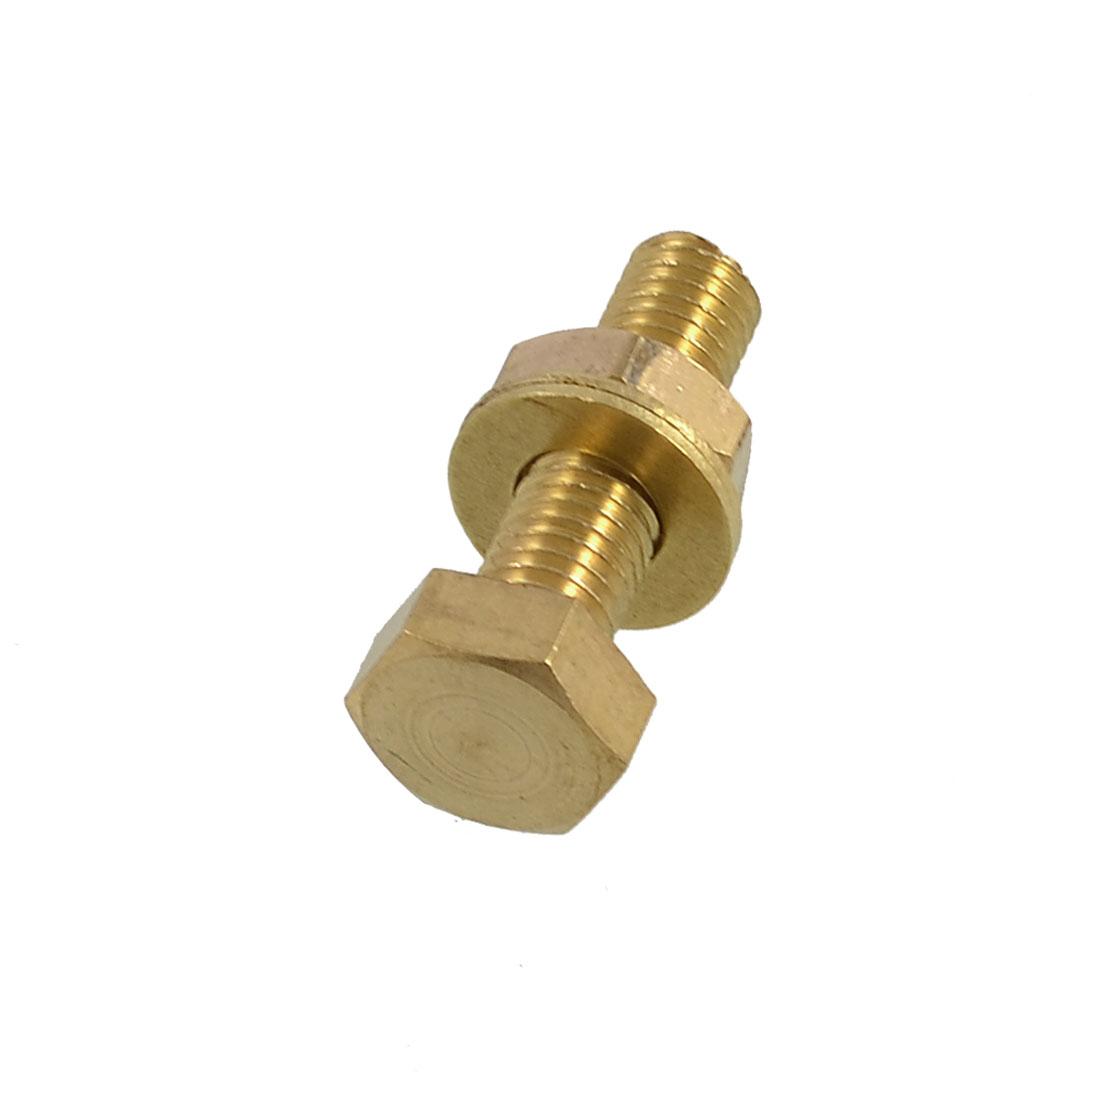 Brass 10mm x 35mm Male Thread Hex Head Screw Nut Washer Set